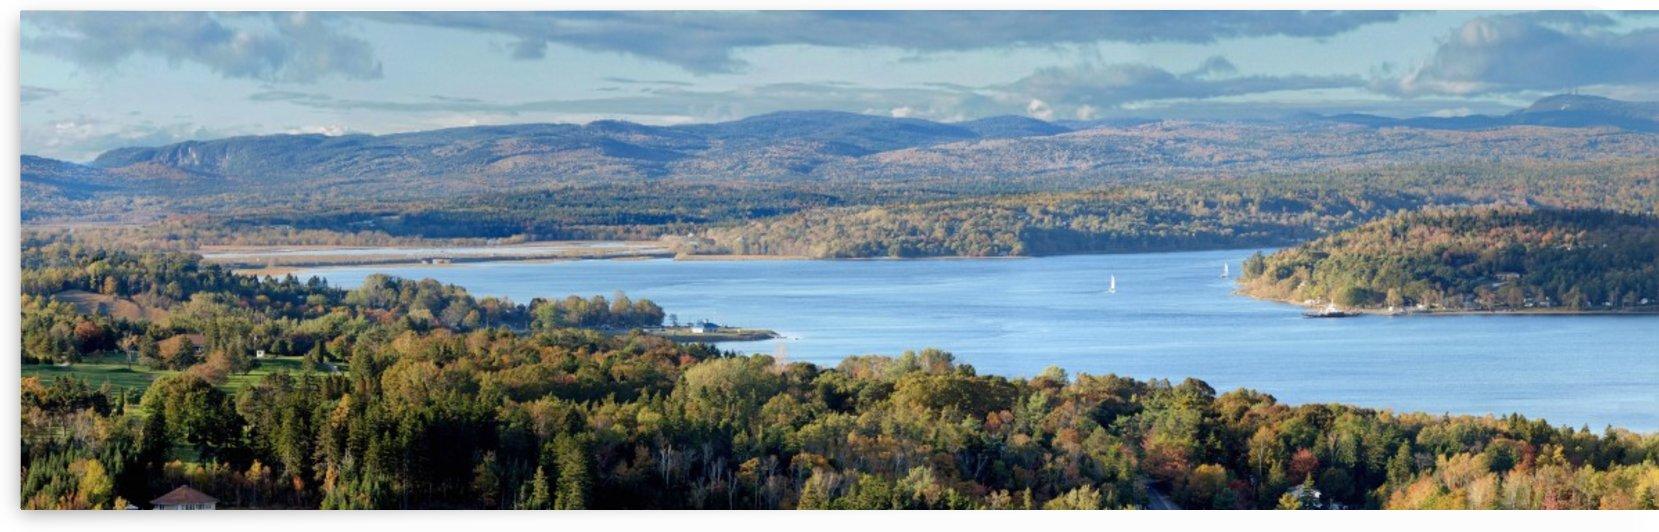 Grand Bay-Westfield, New Brunswick, Oct. 10, 2014 by Doug McQuinn